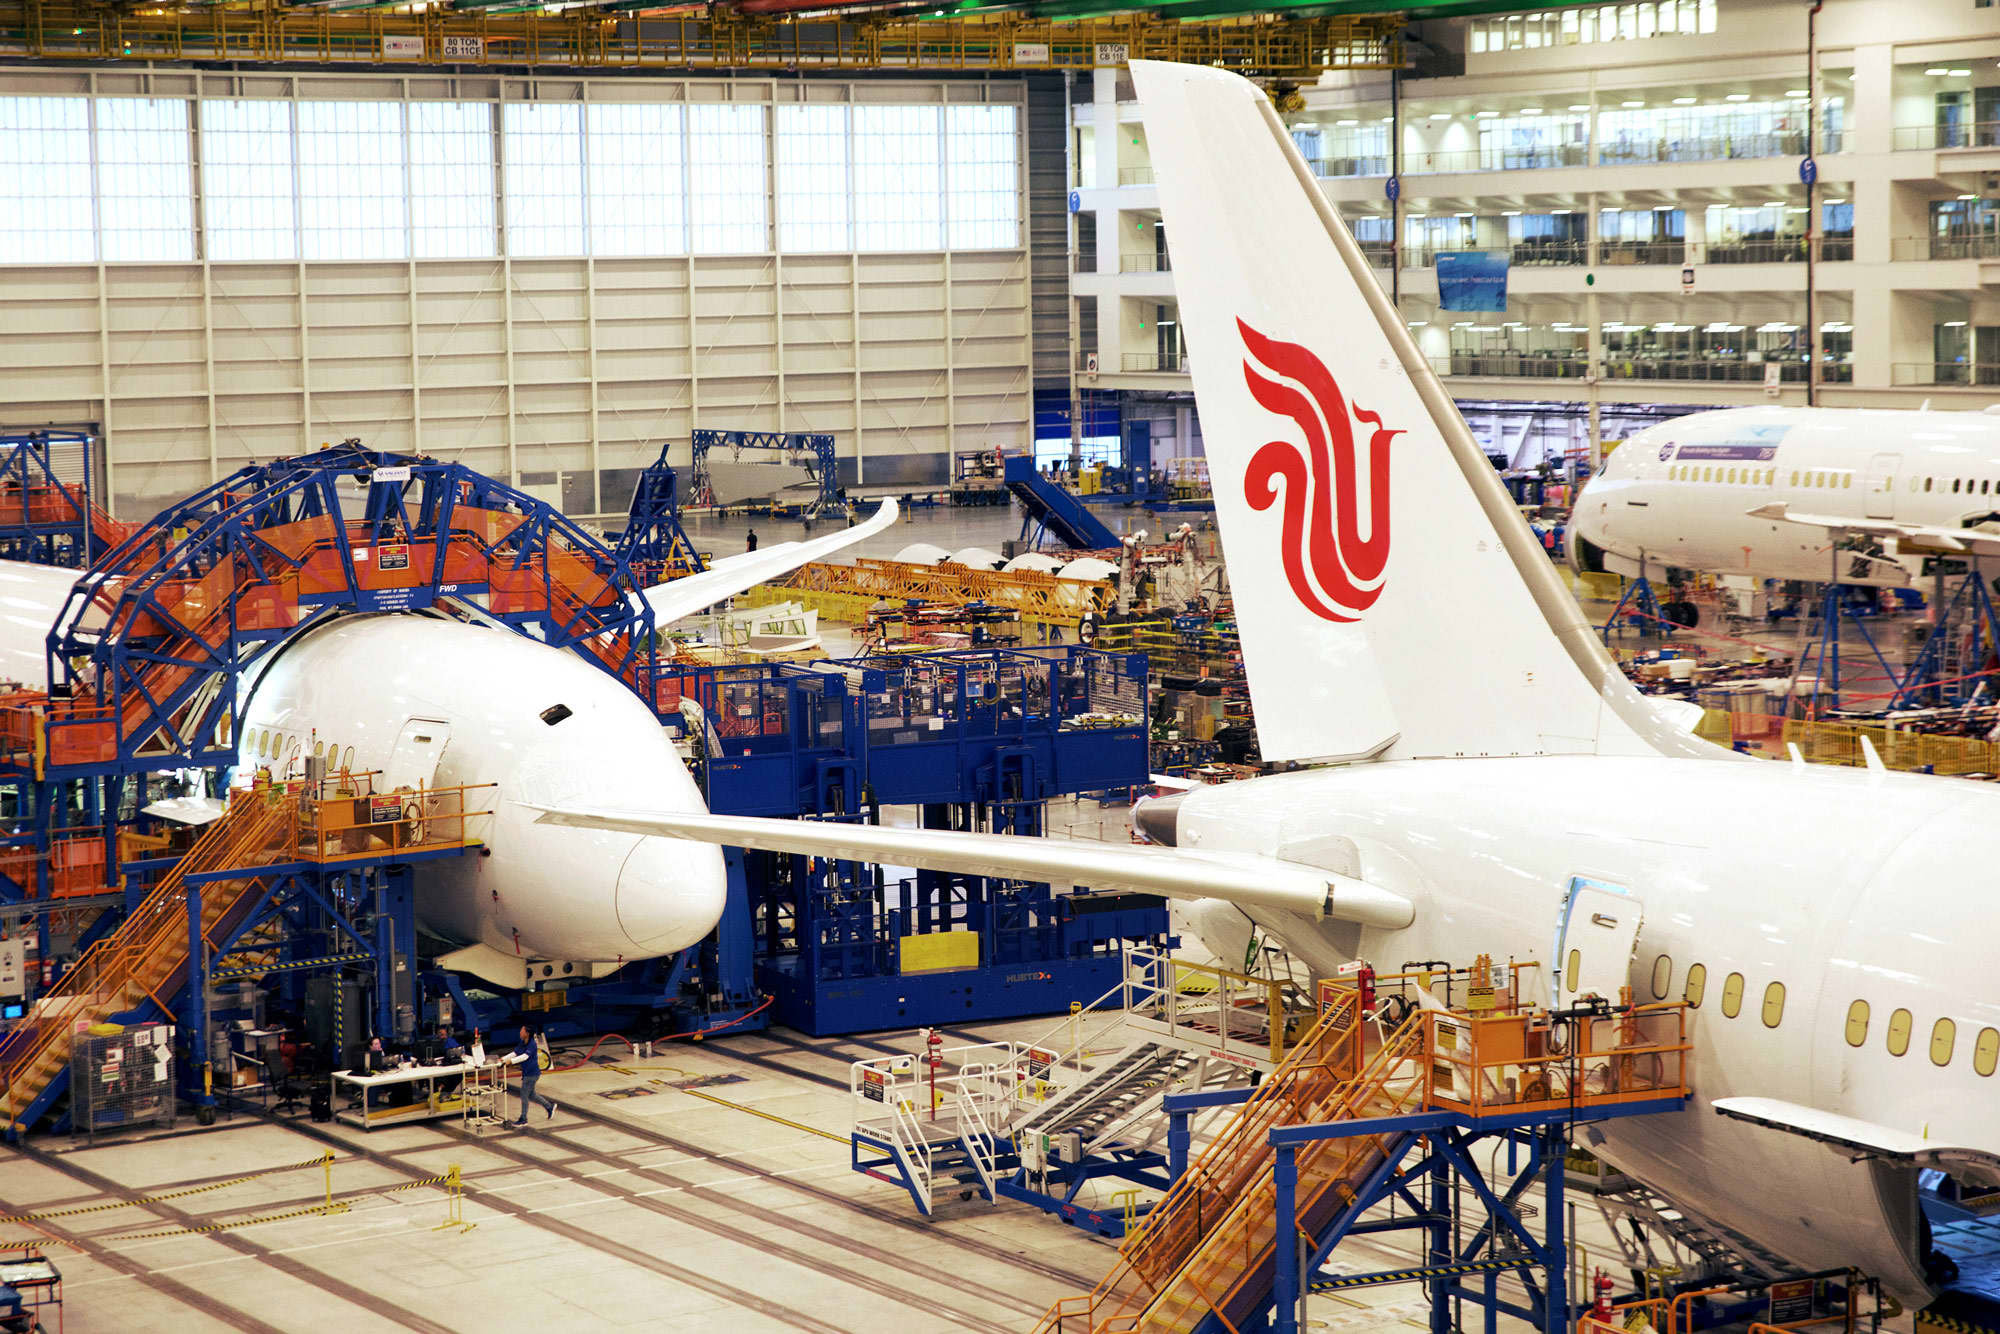 Coronavirus brings Boeing's US airplane production to a halt after South Carolina closure